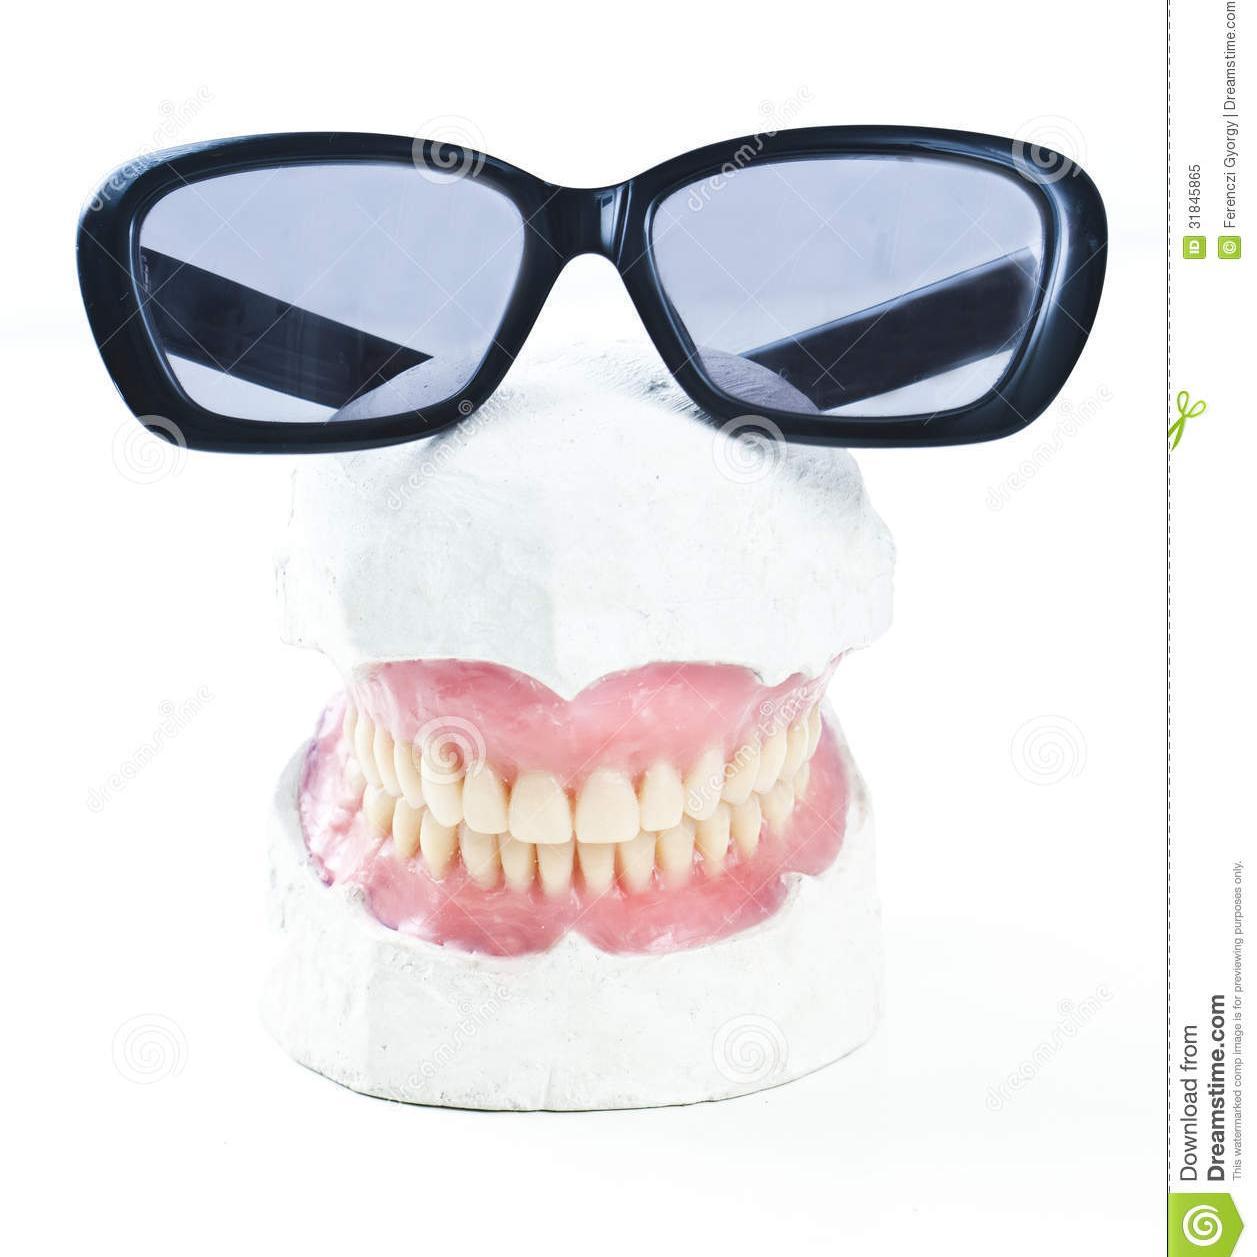 Dentophilia